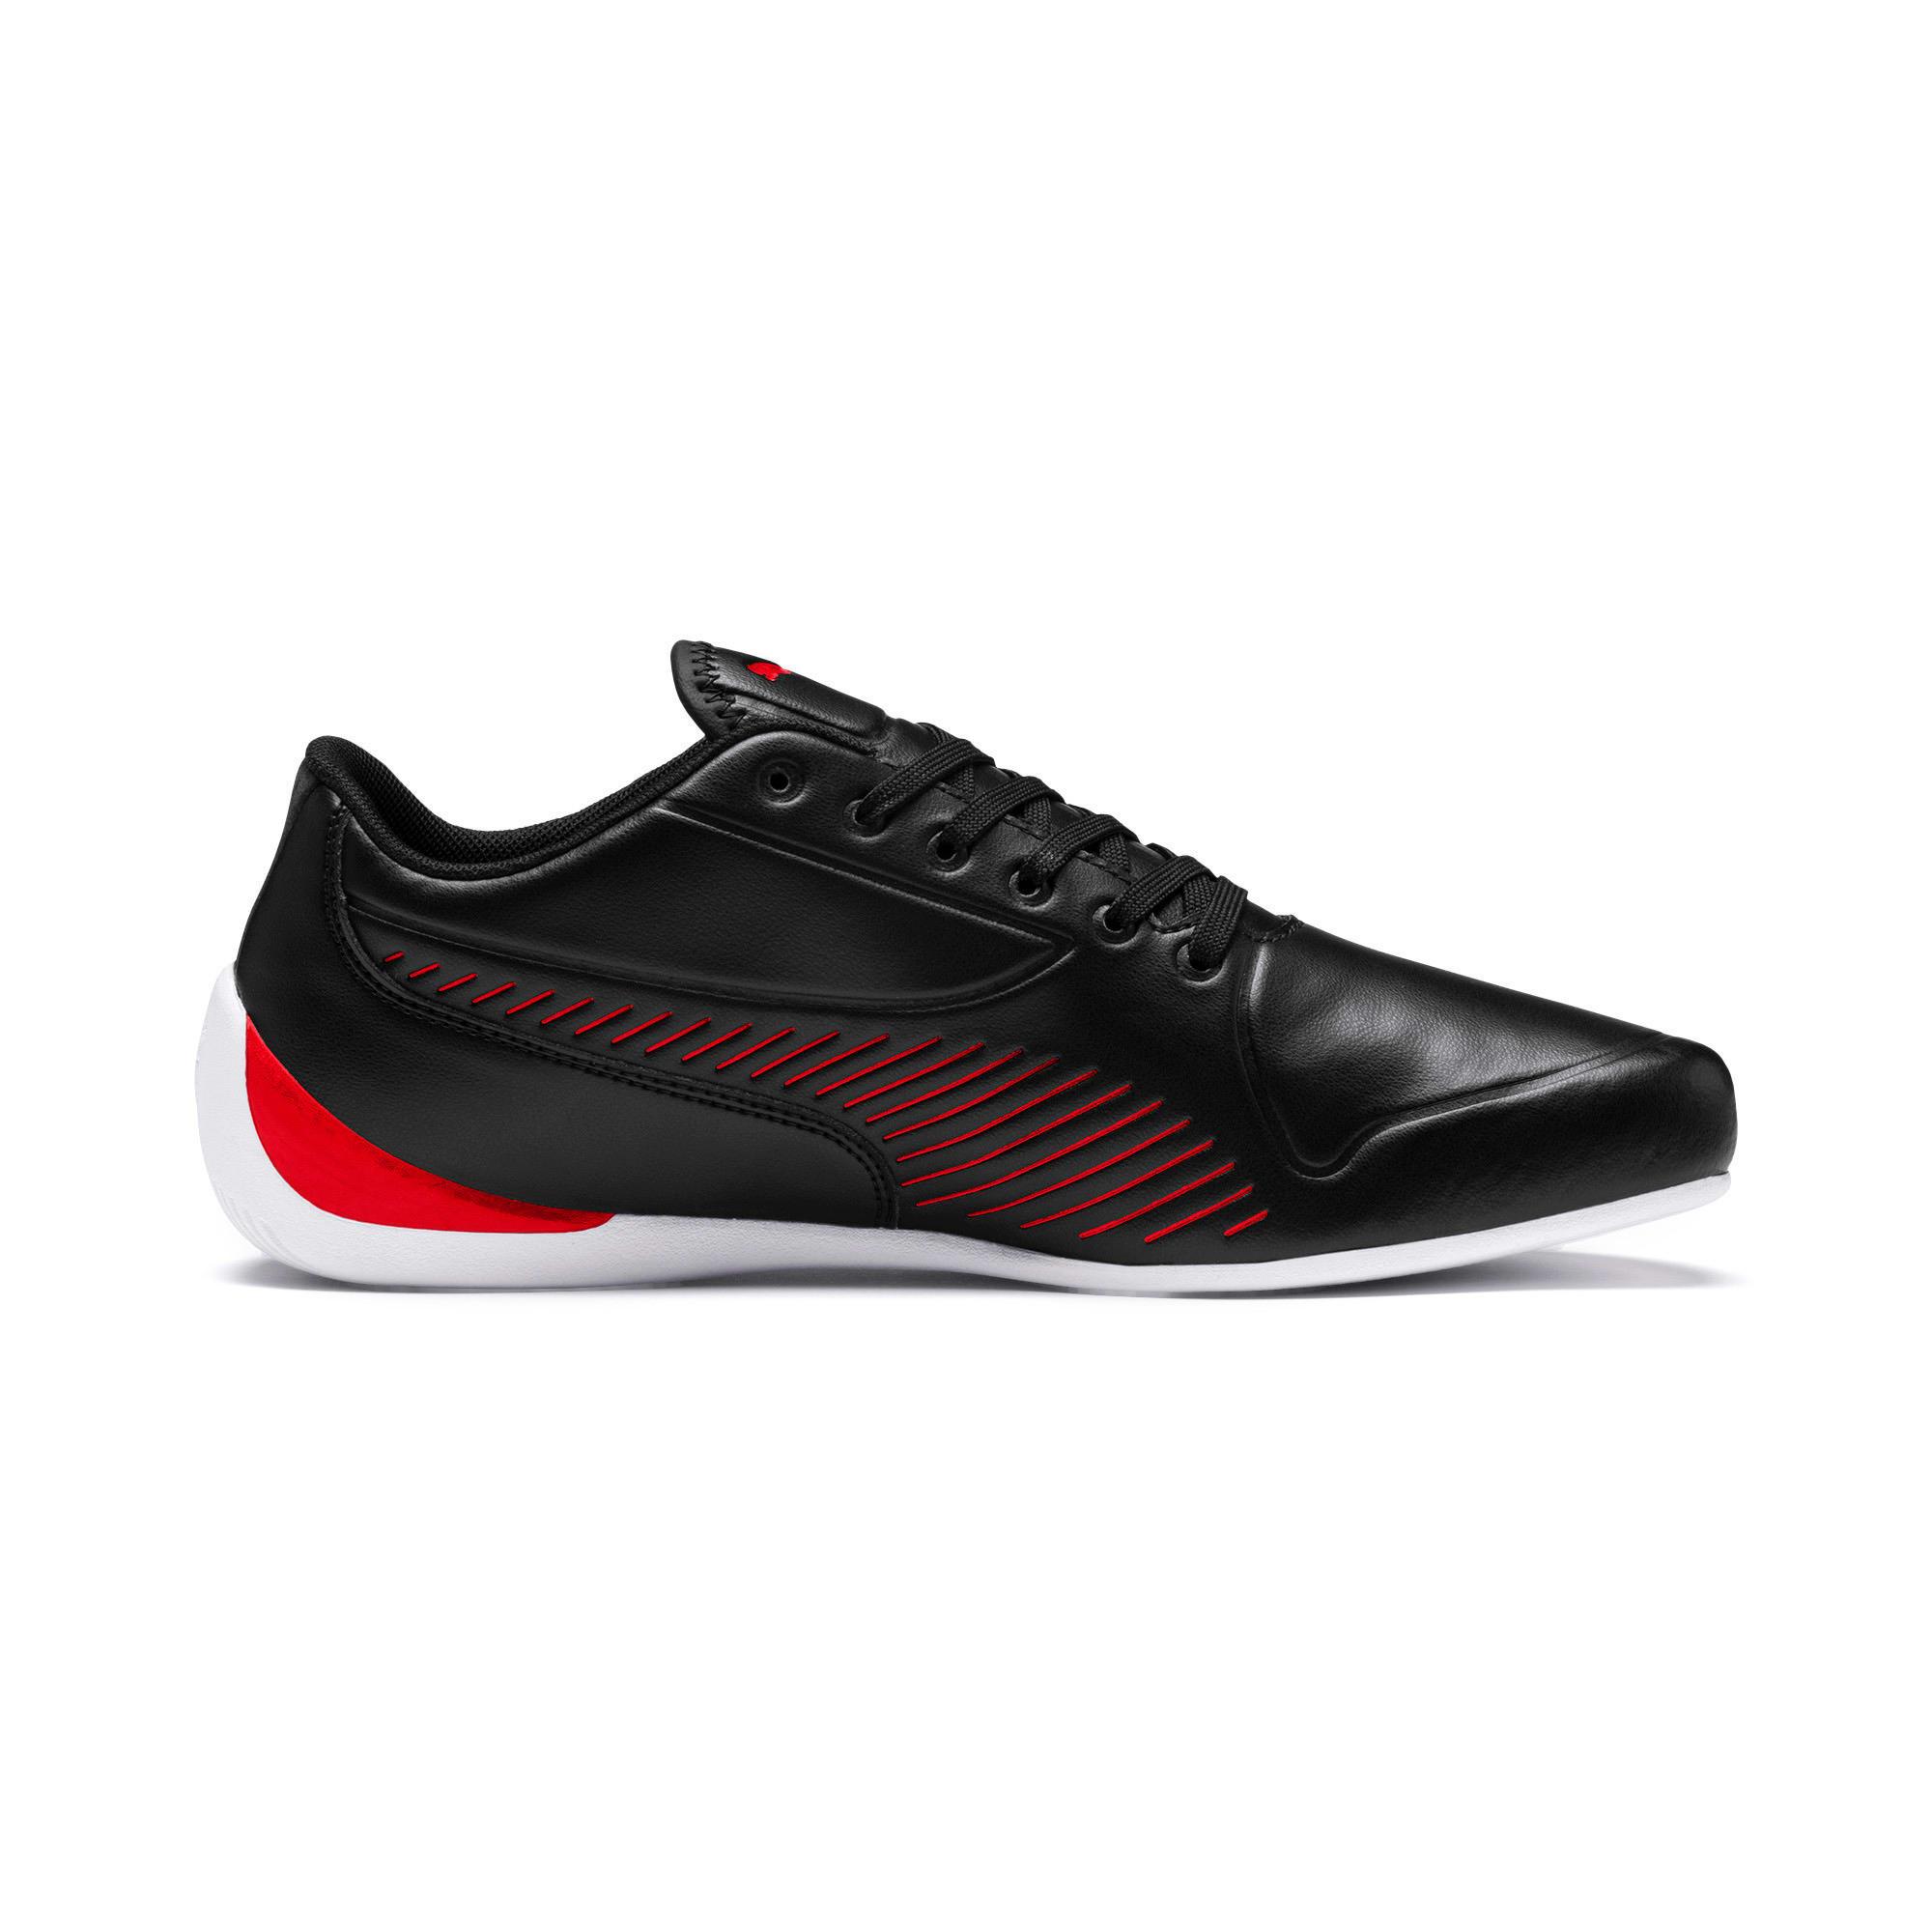 Thumbnail 5 of Scuderia Ferrari Drift Cat 7S Ultra Men's Shoes, Puma Black-Rosso Corsa, medium